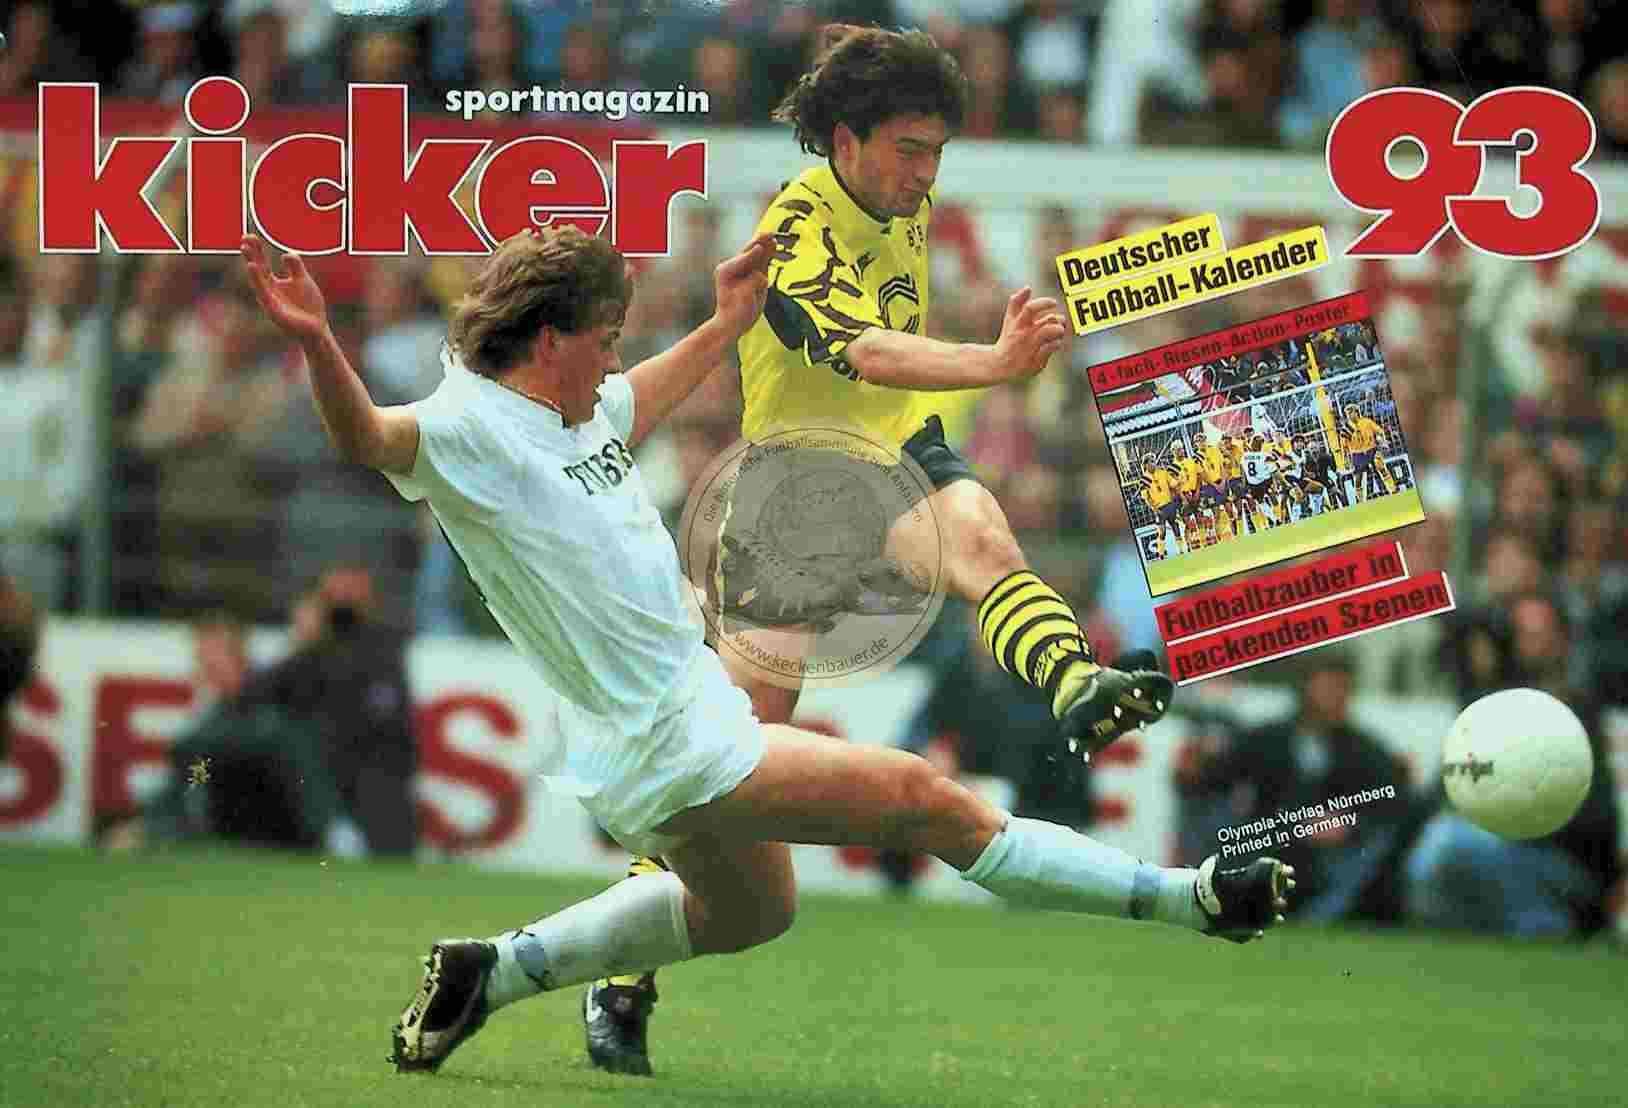 1993 Kicker Kalender